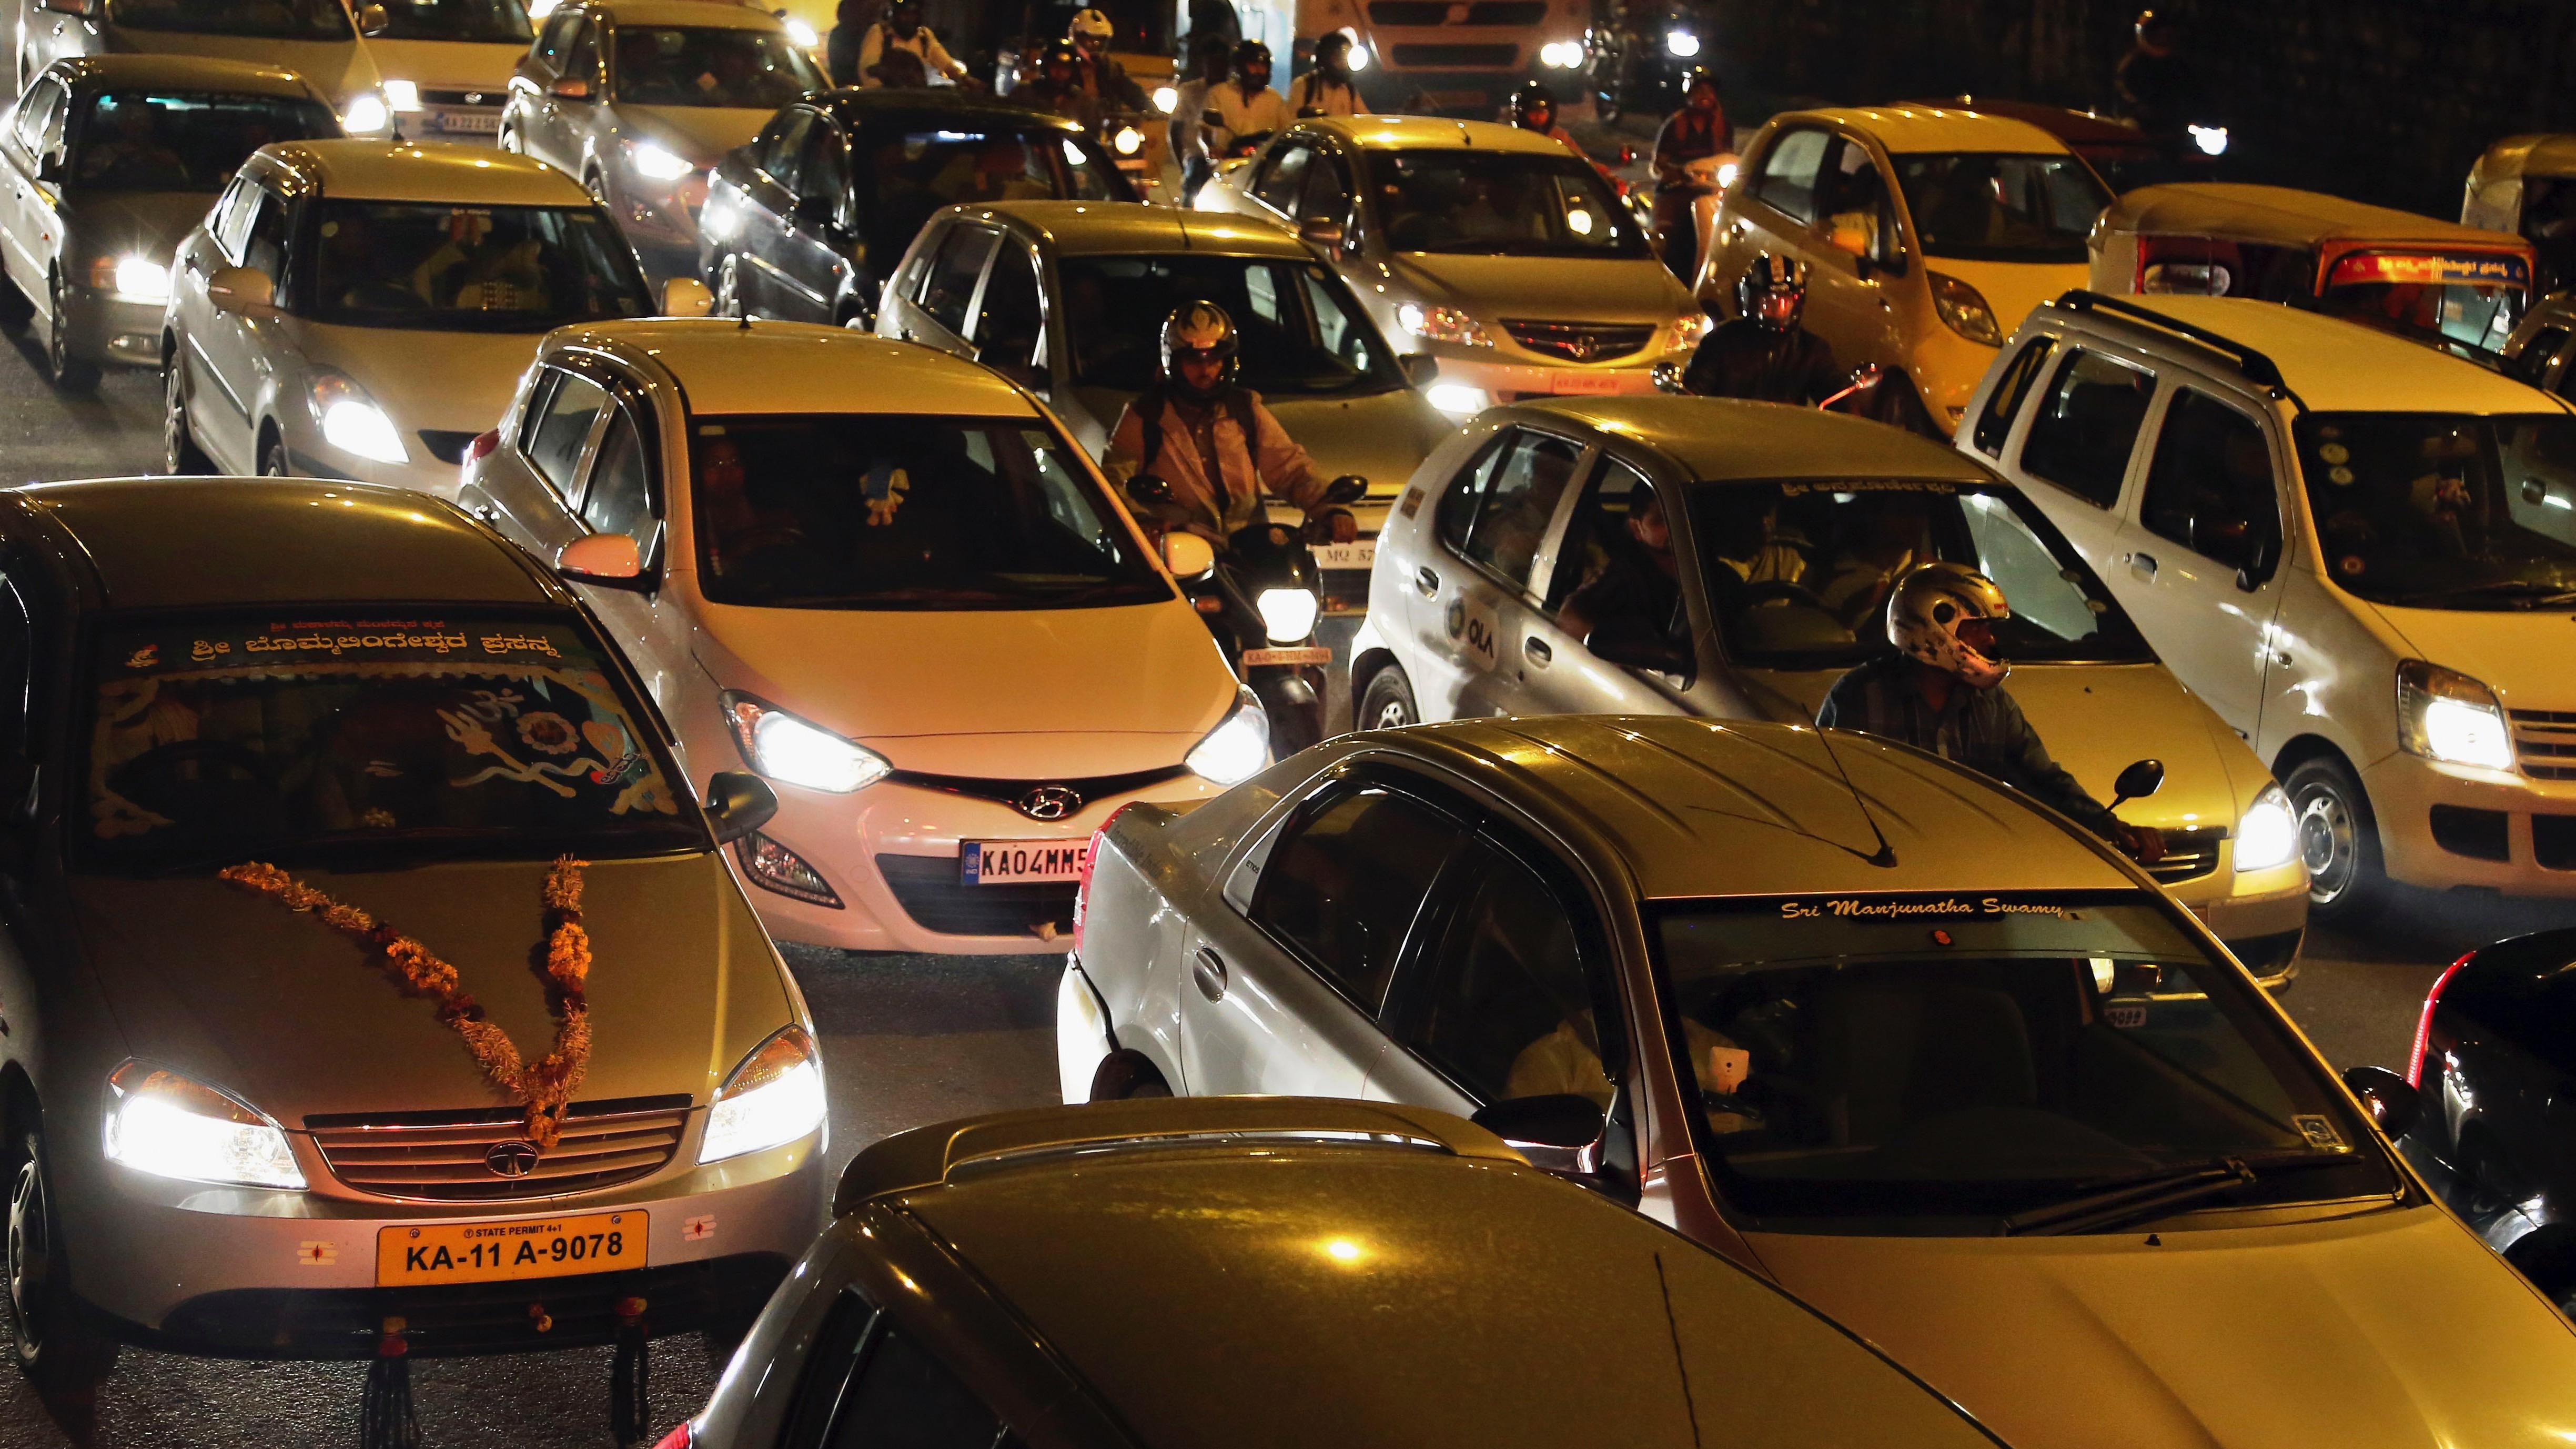 Bangalore crowded road